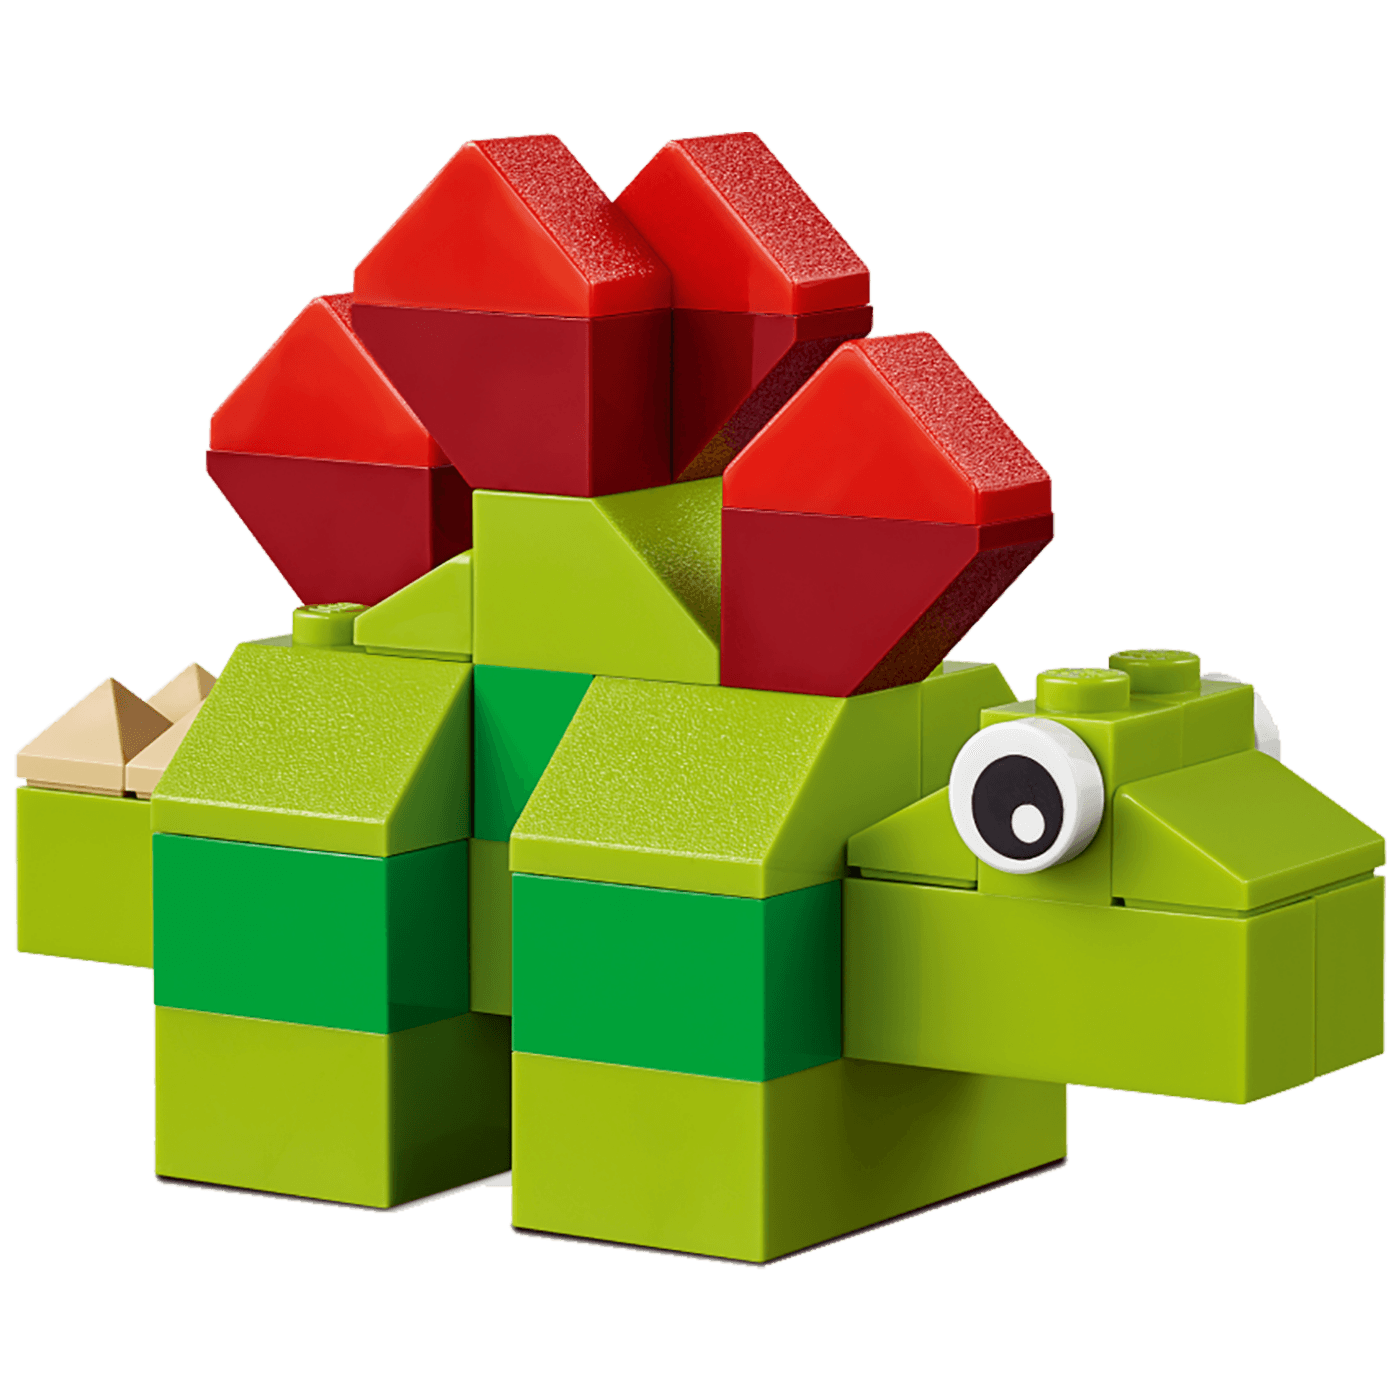 Osnovni komplet kockica, LEGO Classic